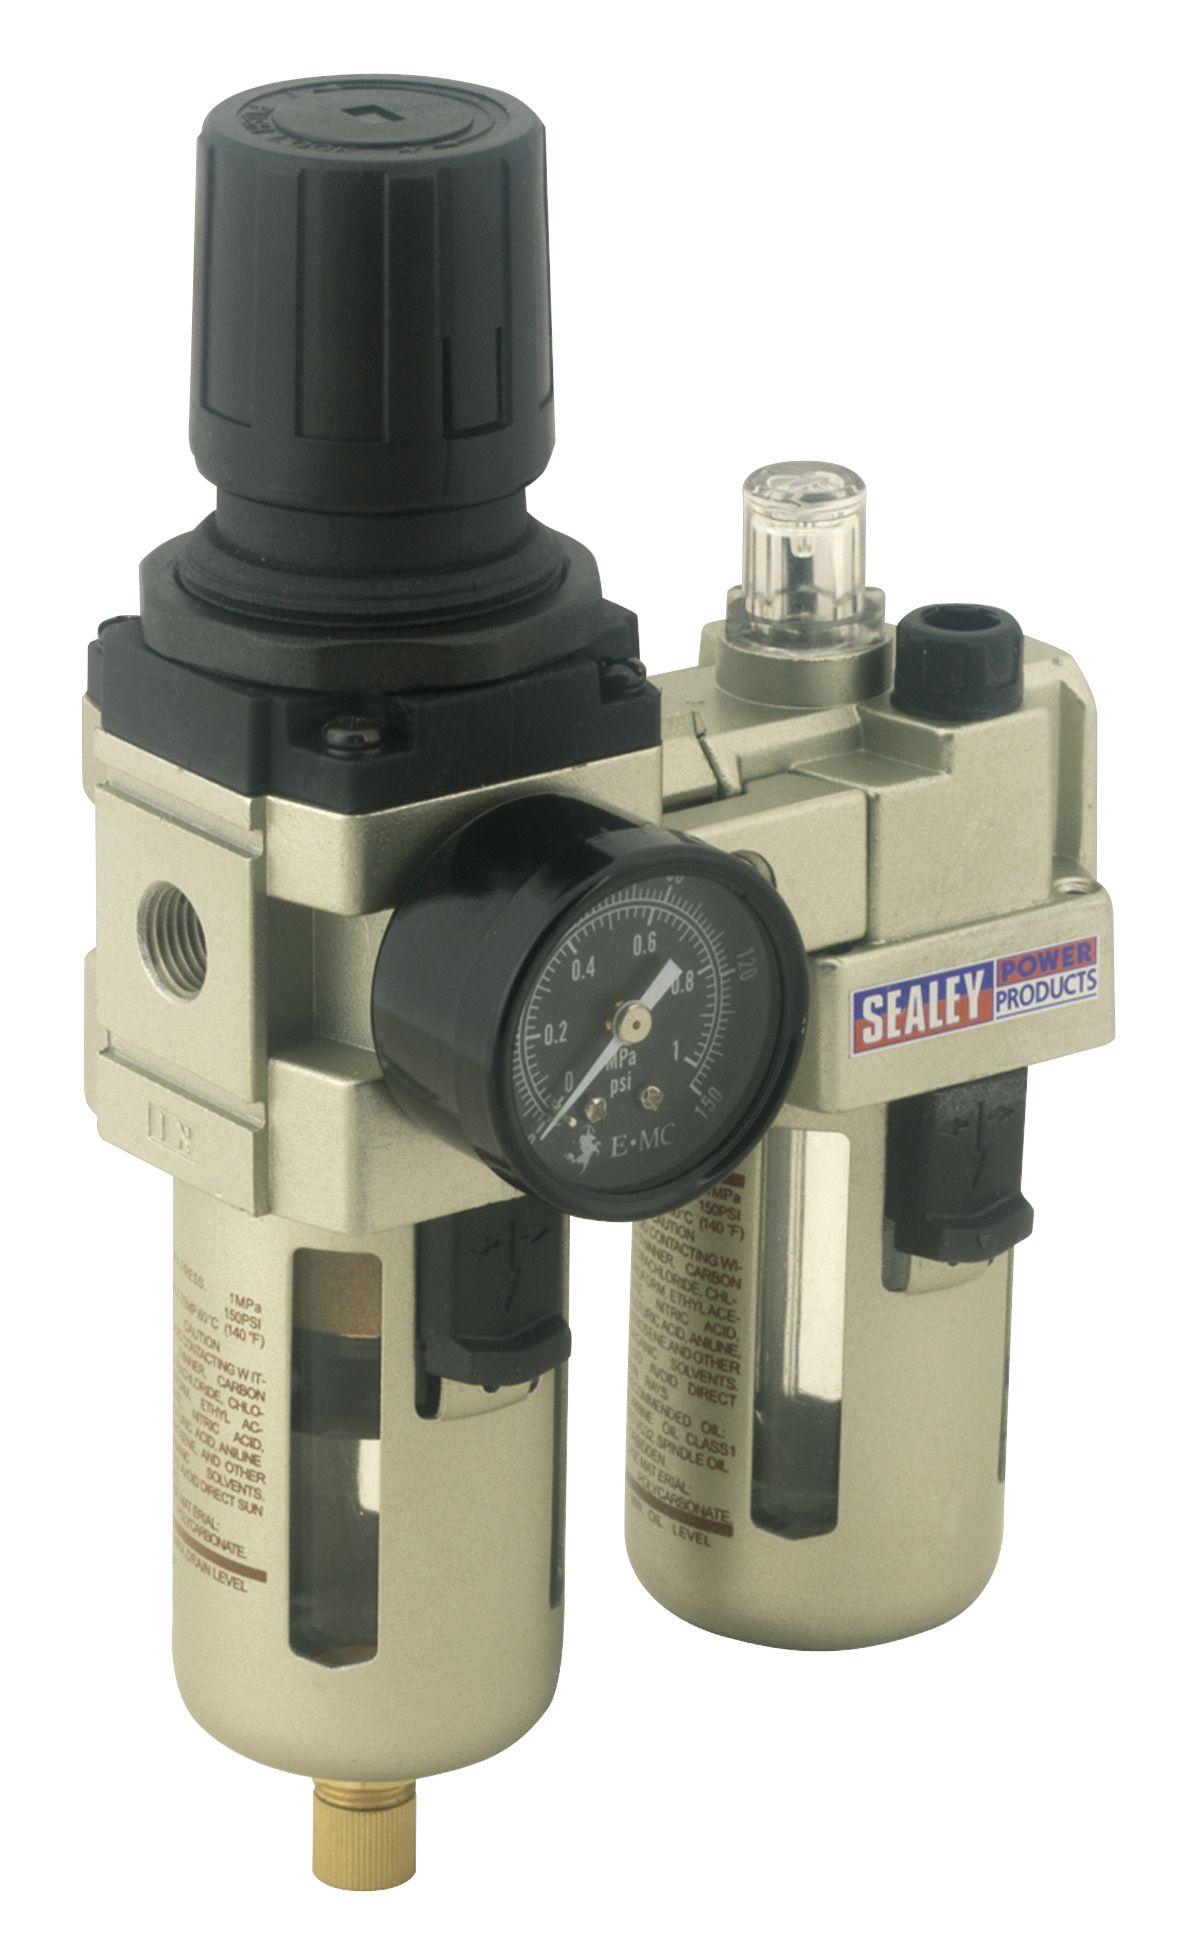 Sealey Air Filter/Regulator/Lubricator Max Airflow 60cfm